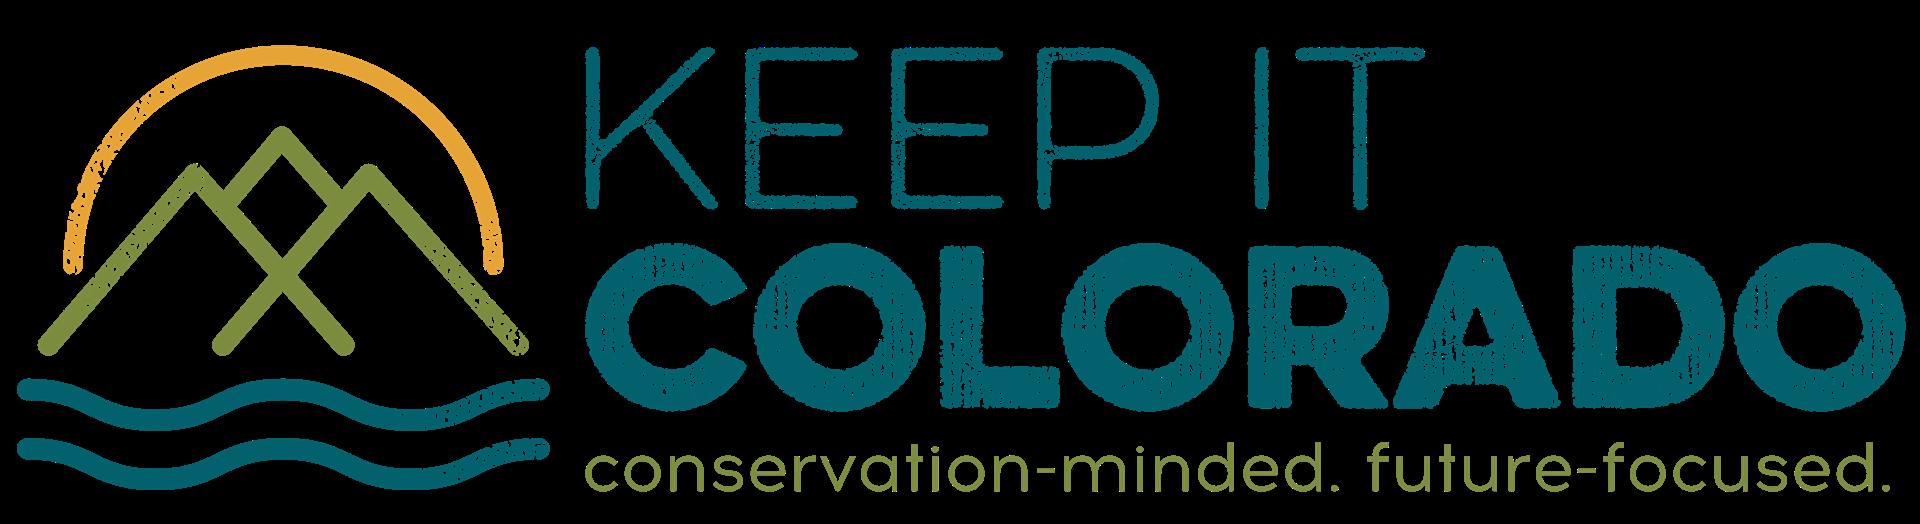 KeepitColorado_Logo_StackedHorizantal_withTag_CMYK.png